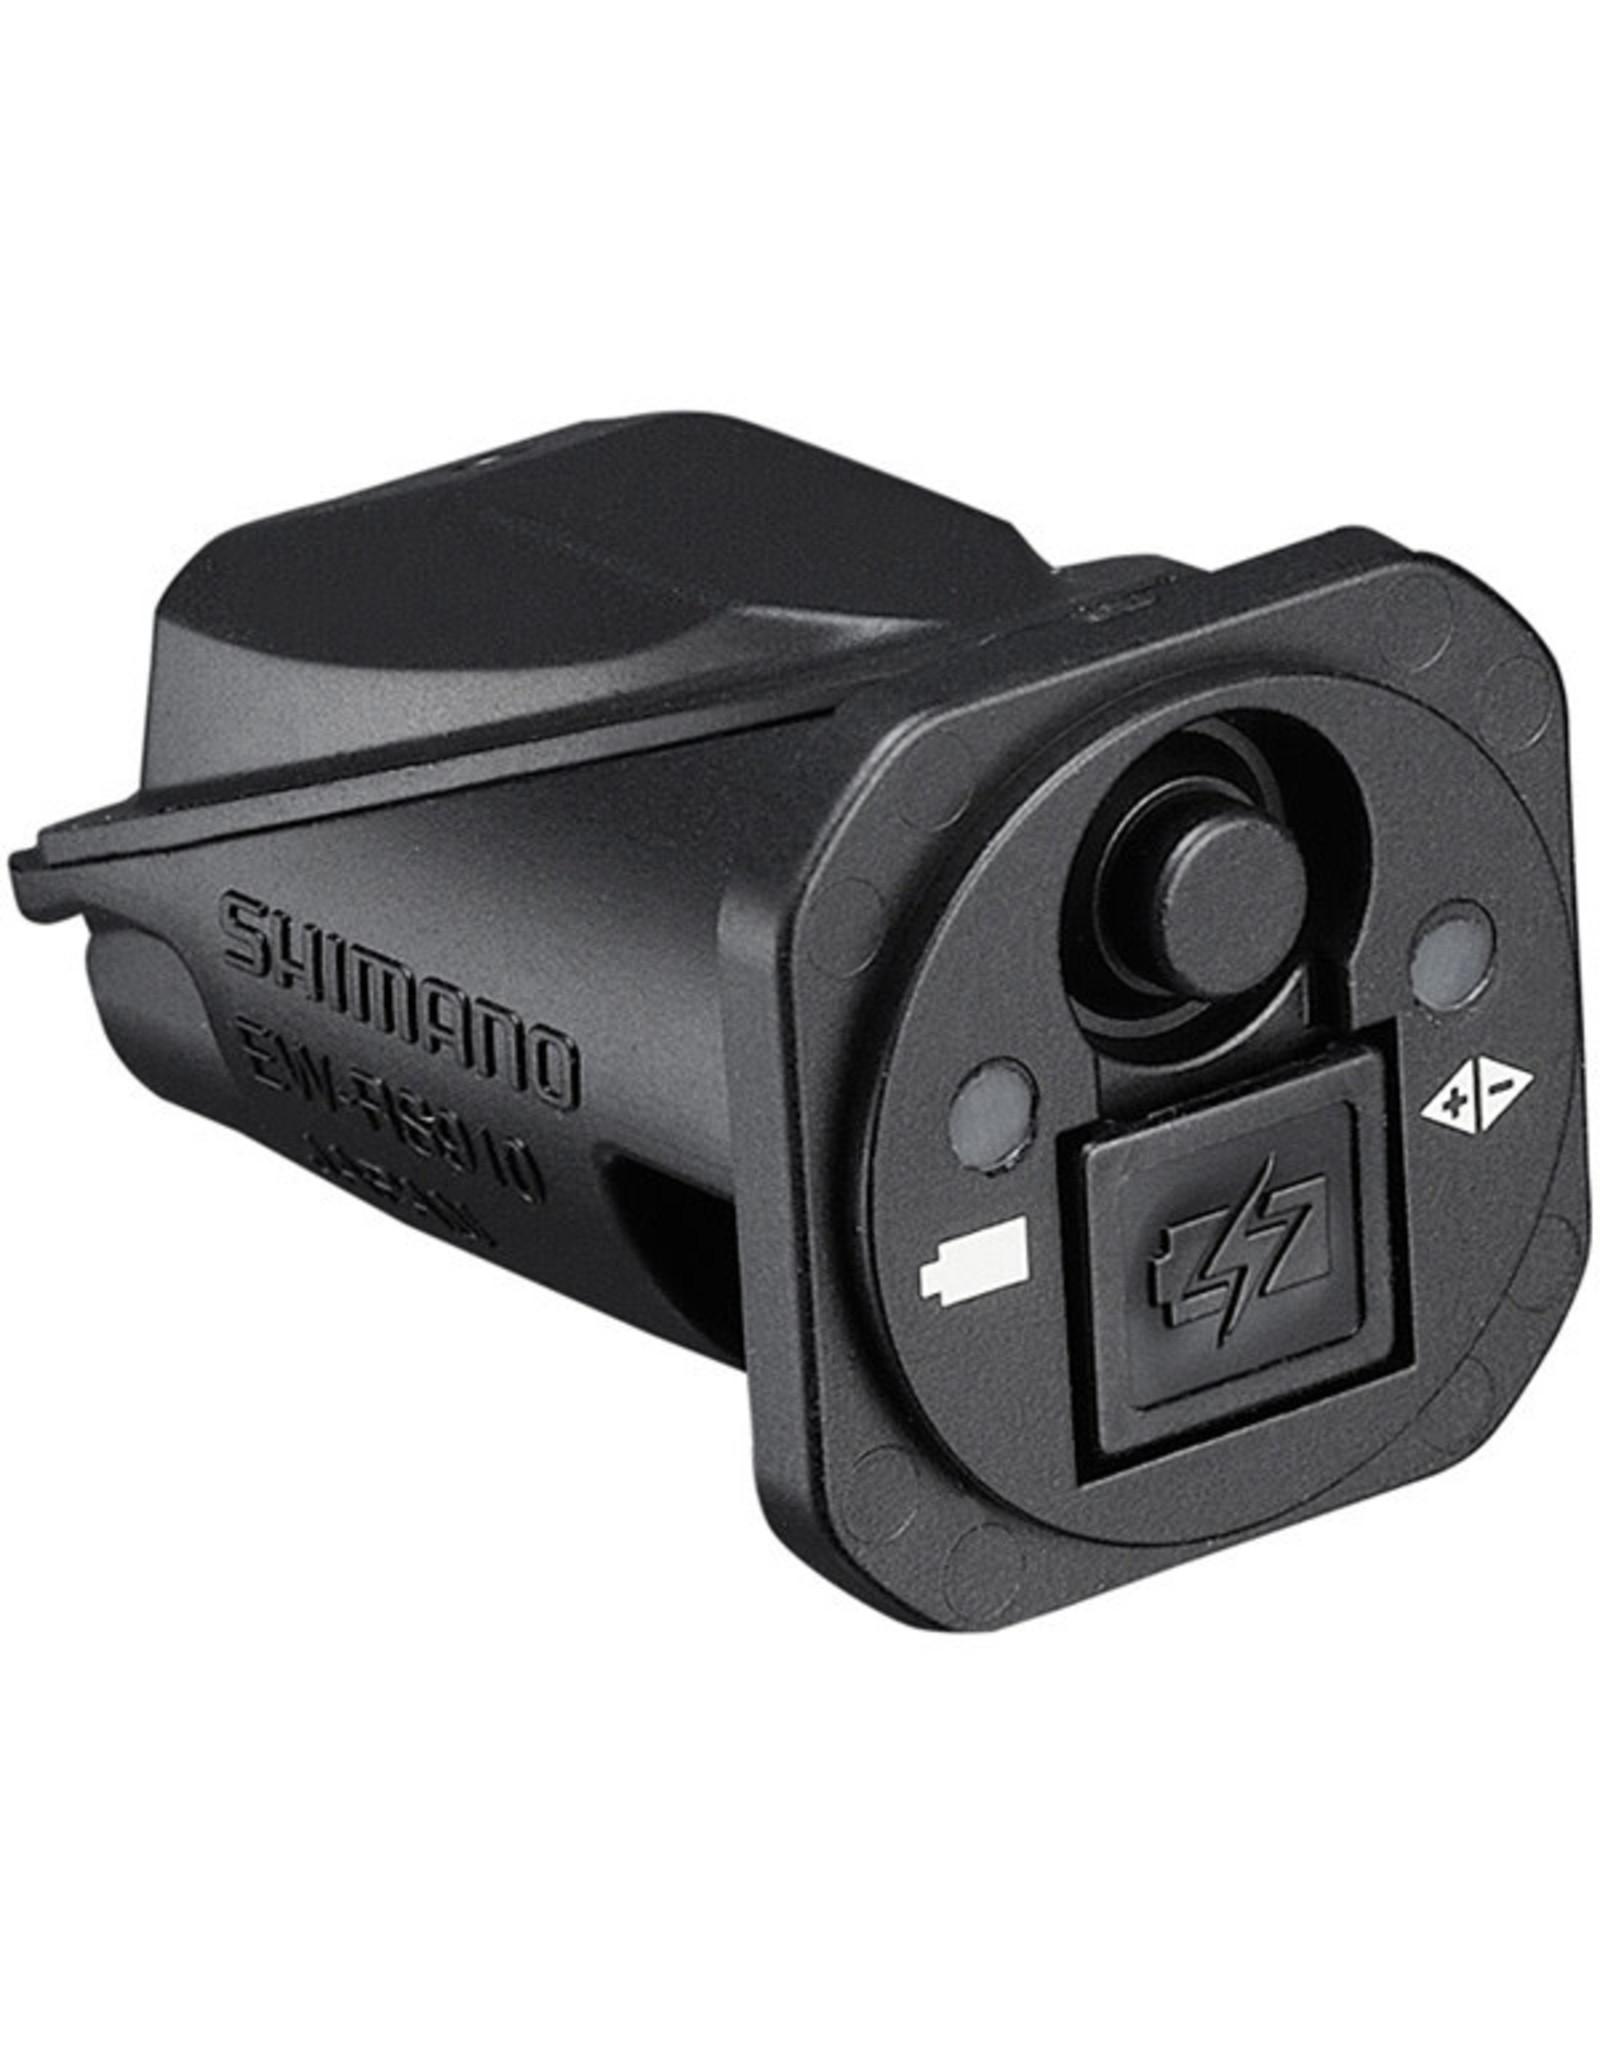 Shimano Di2 Junction Box A EW-RS910